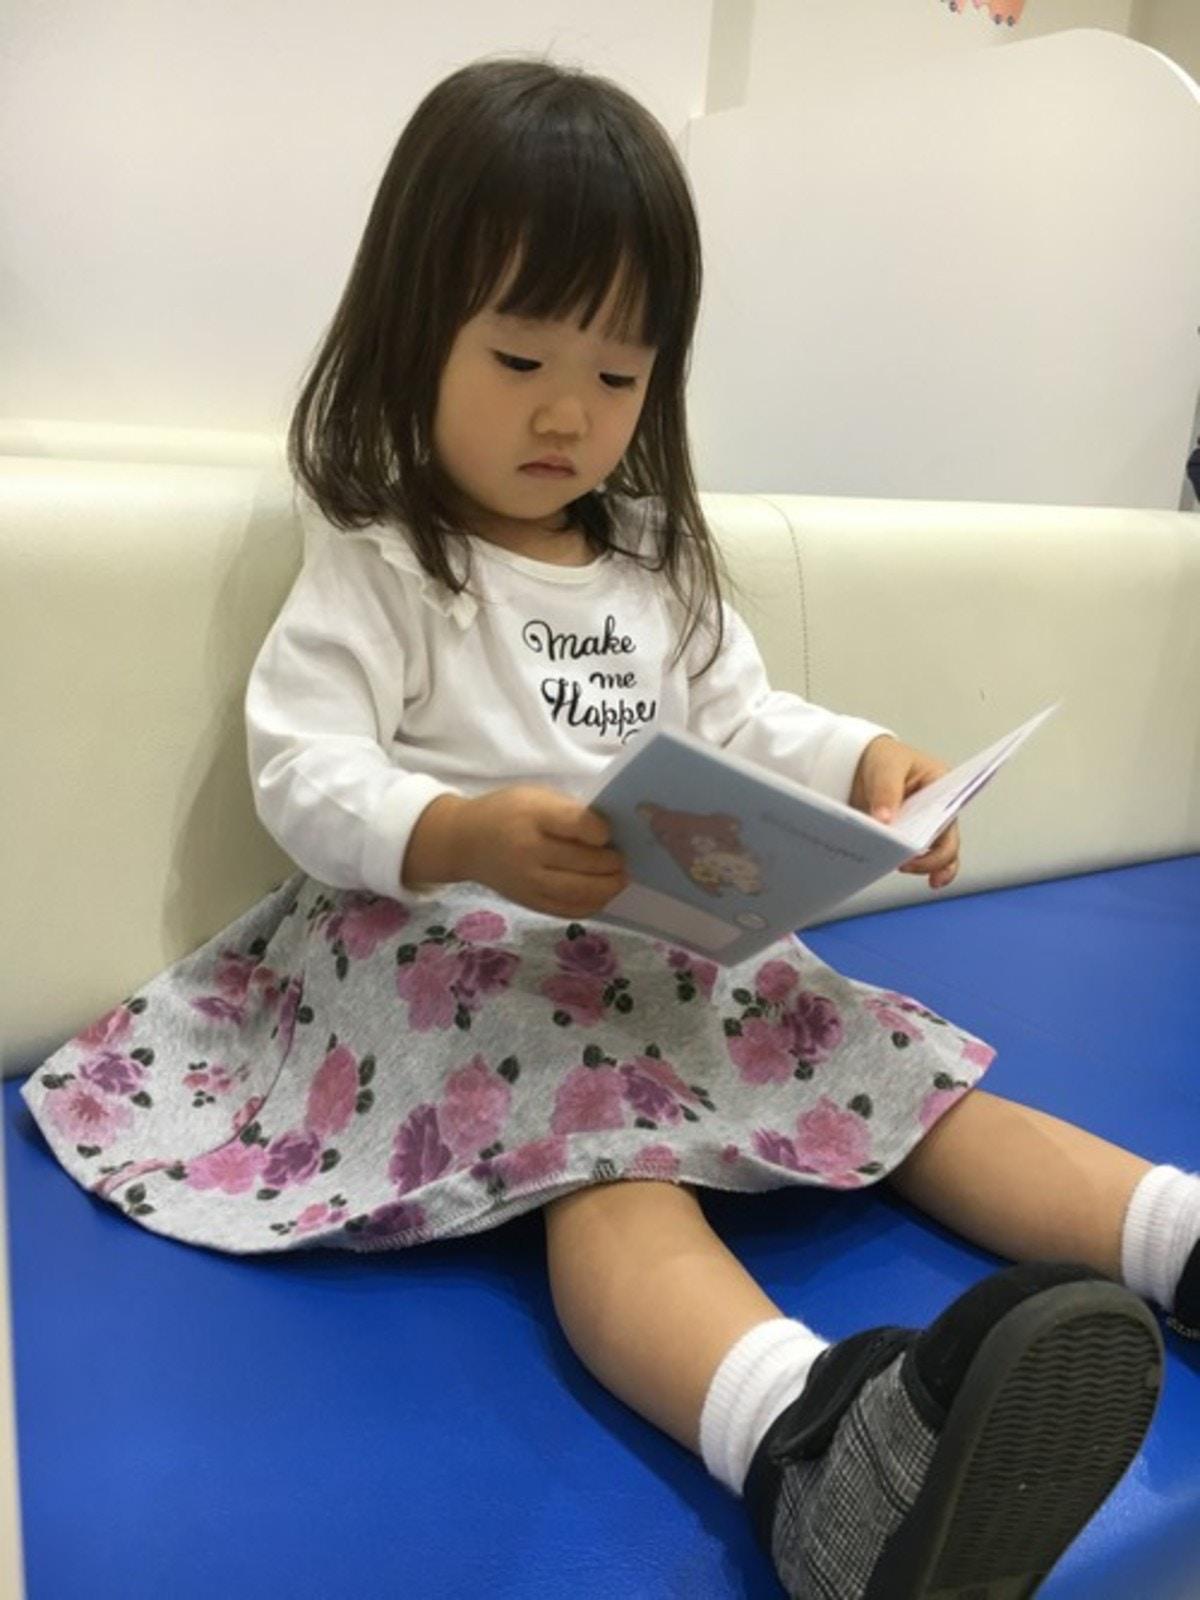 bac912267df67 コムサイズム(COMME CA ISM)のシンプル可愛いベビー服でオシャレ親子に♪ ブランド紹介  ママリ